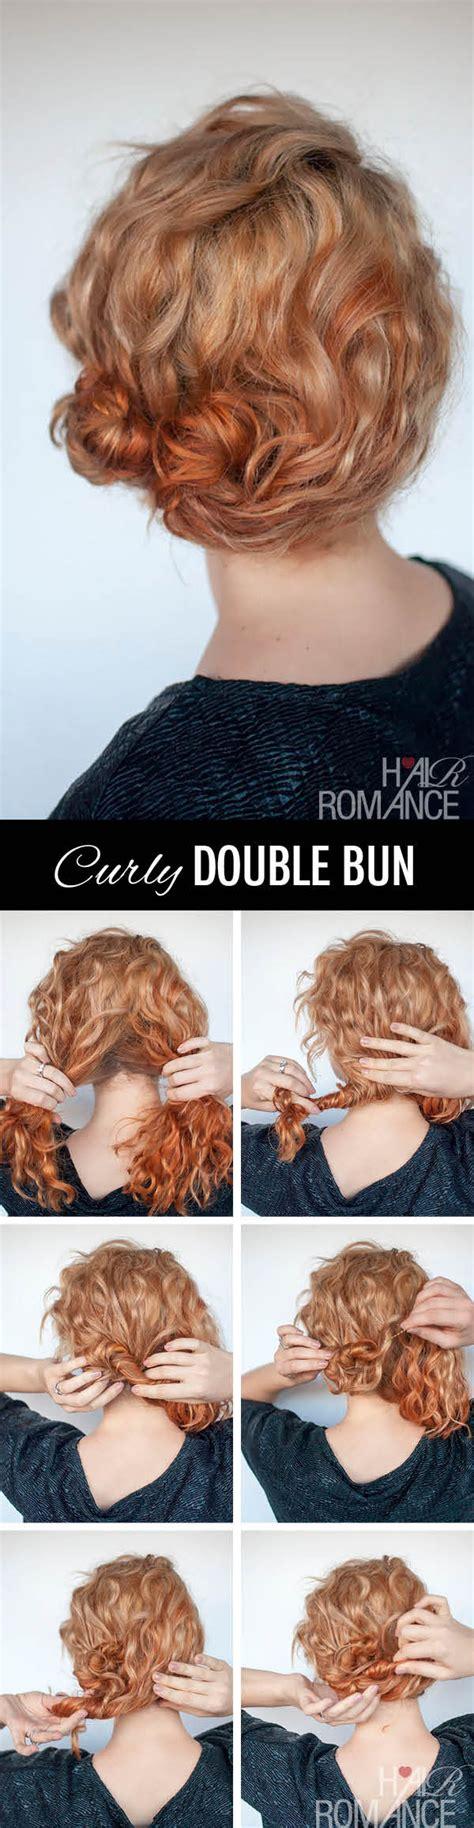 hairstyles curly hair tutorial hairstyle tutorial for curly hair the double bun hair